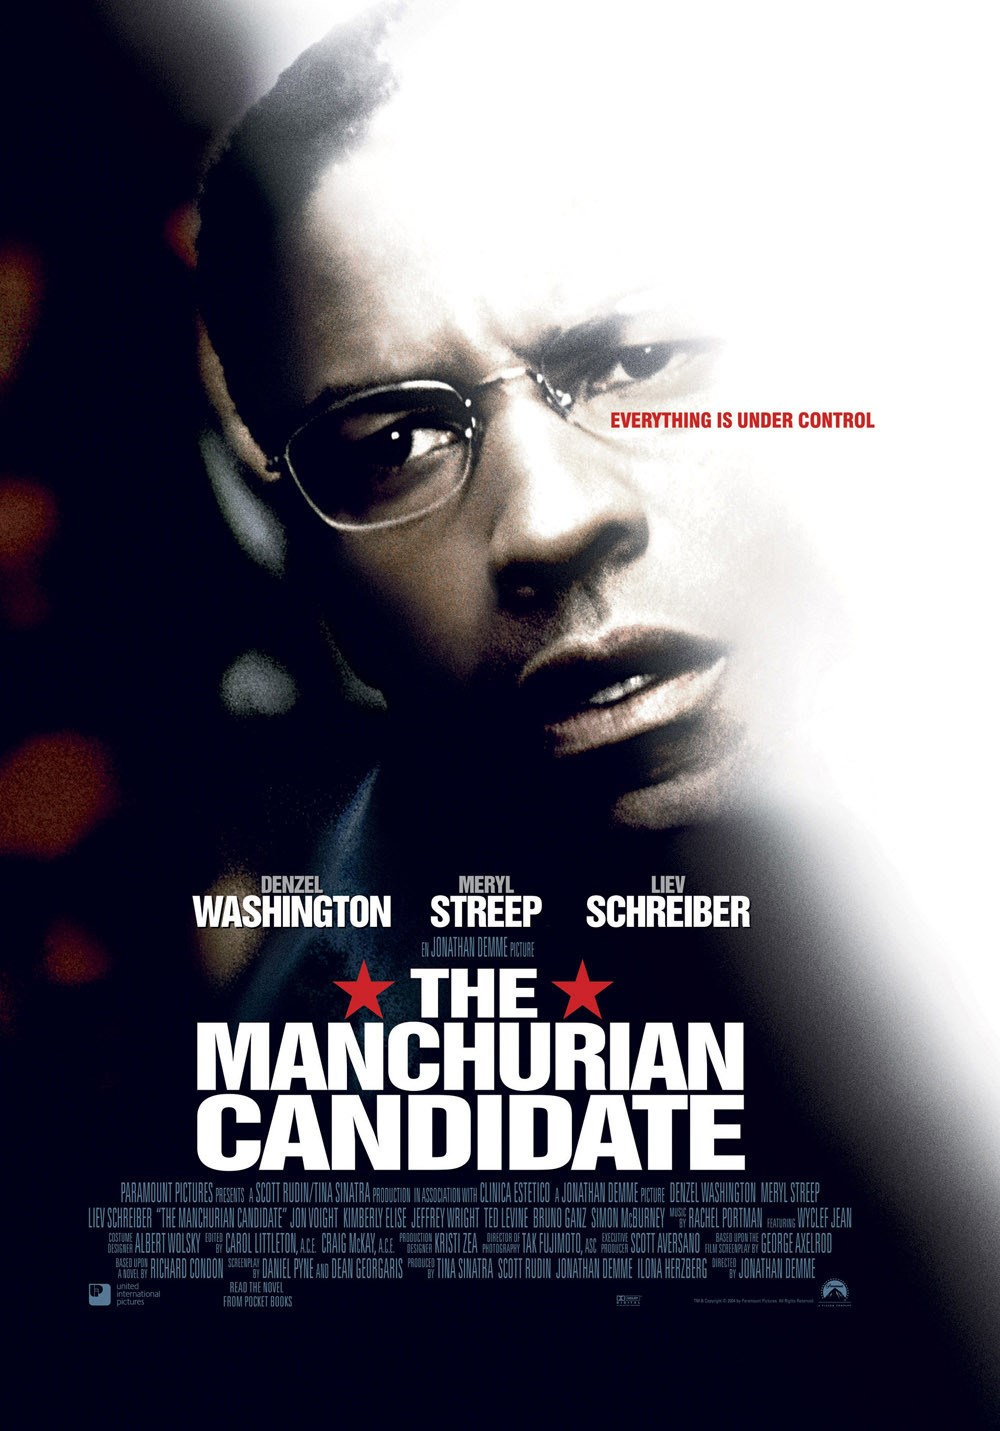 Subscene - The Manchurian Candidate English subtitle